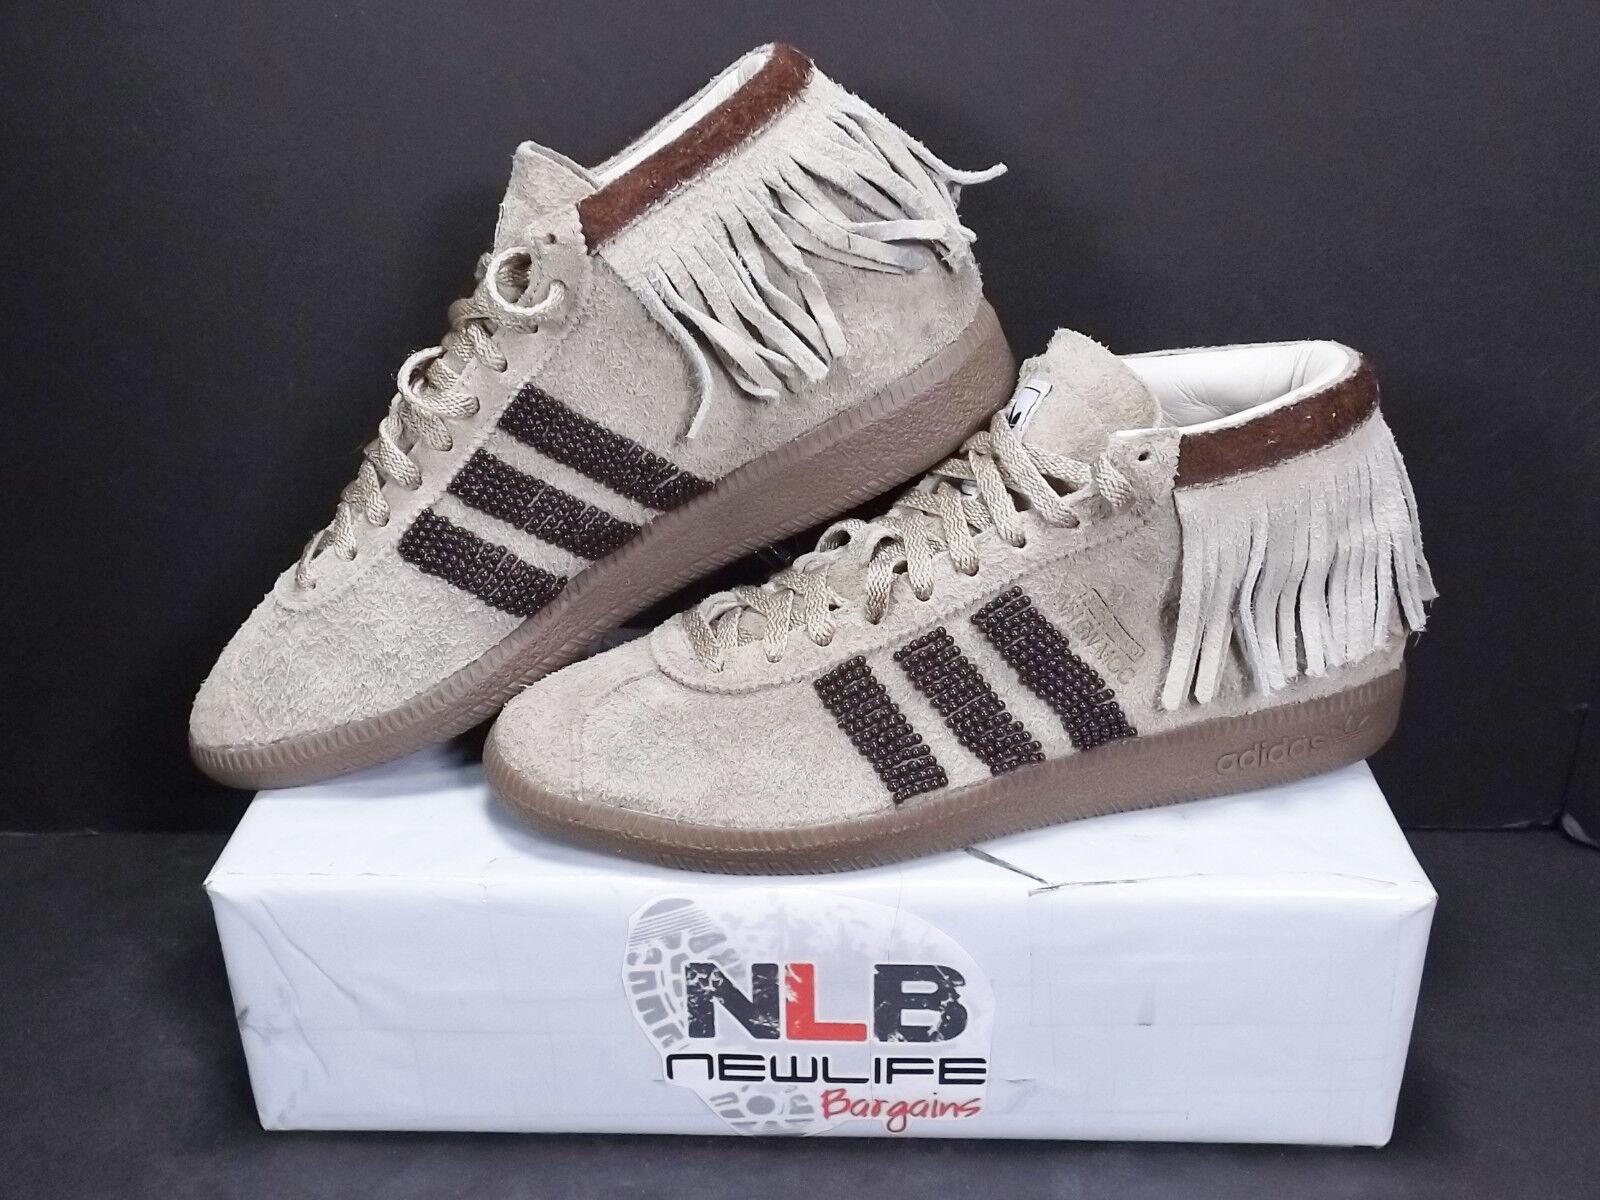 adidas originals mocassins nachbarschaft kg moc brüssel mocassins originals schuhe m25766 männer sz 7.5 30c316